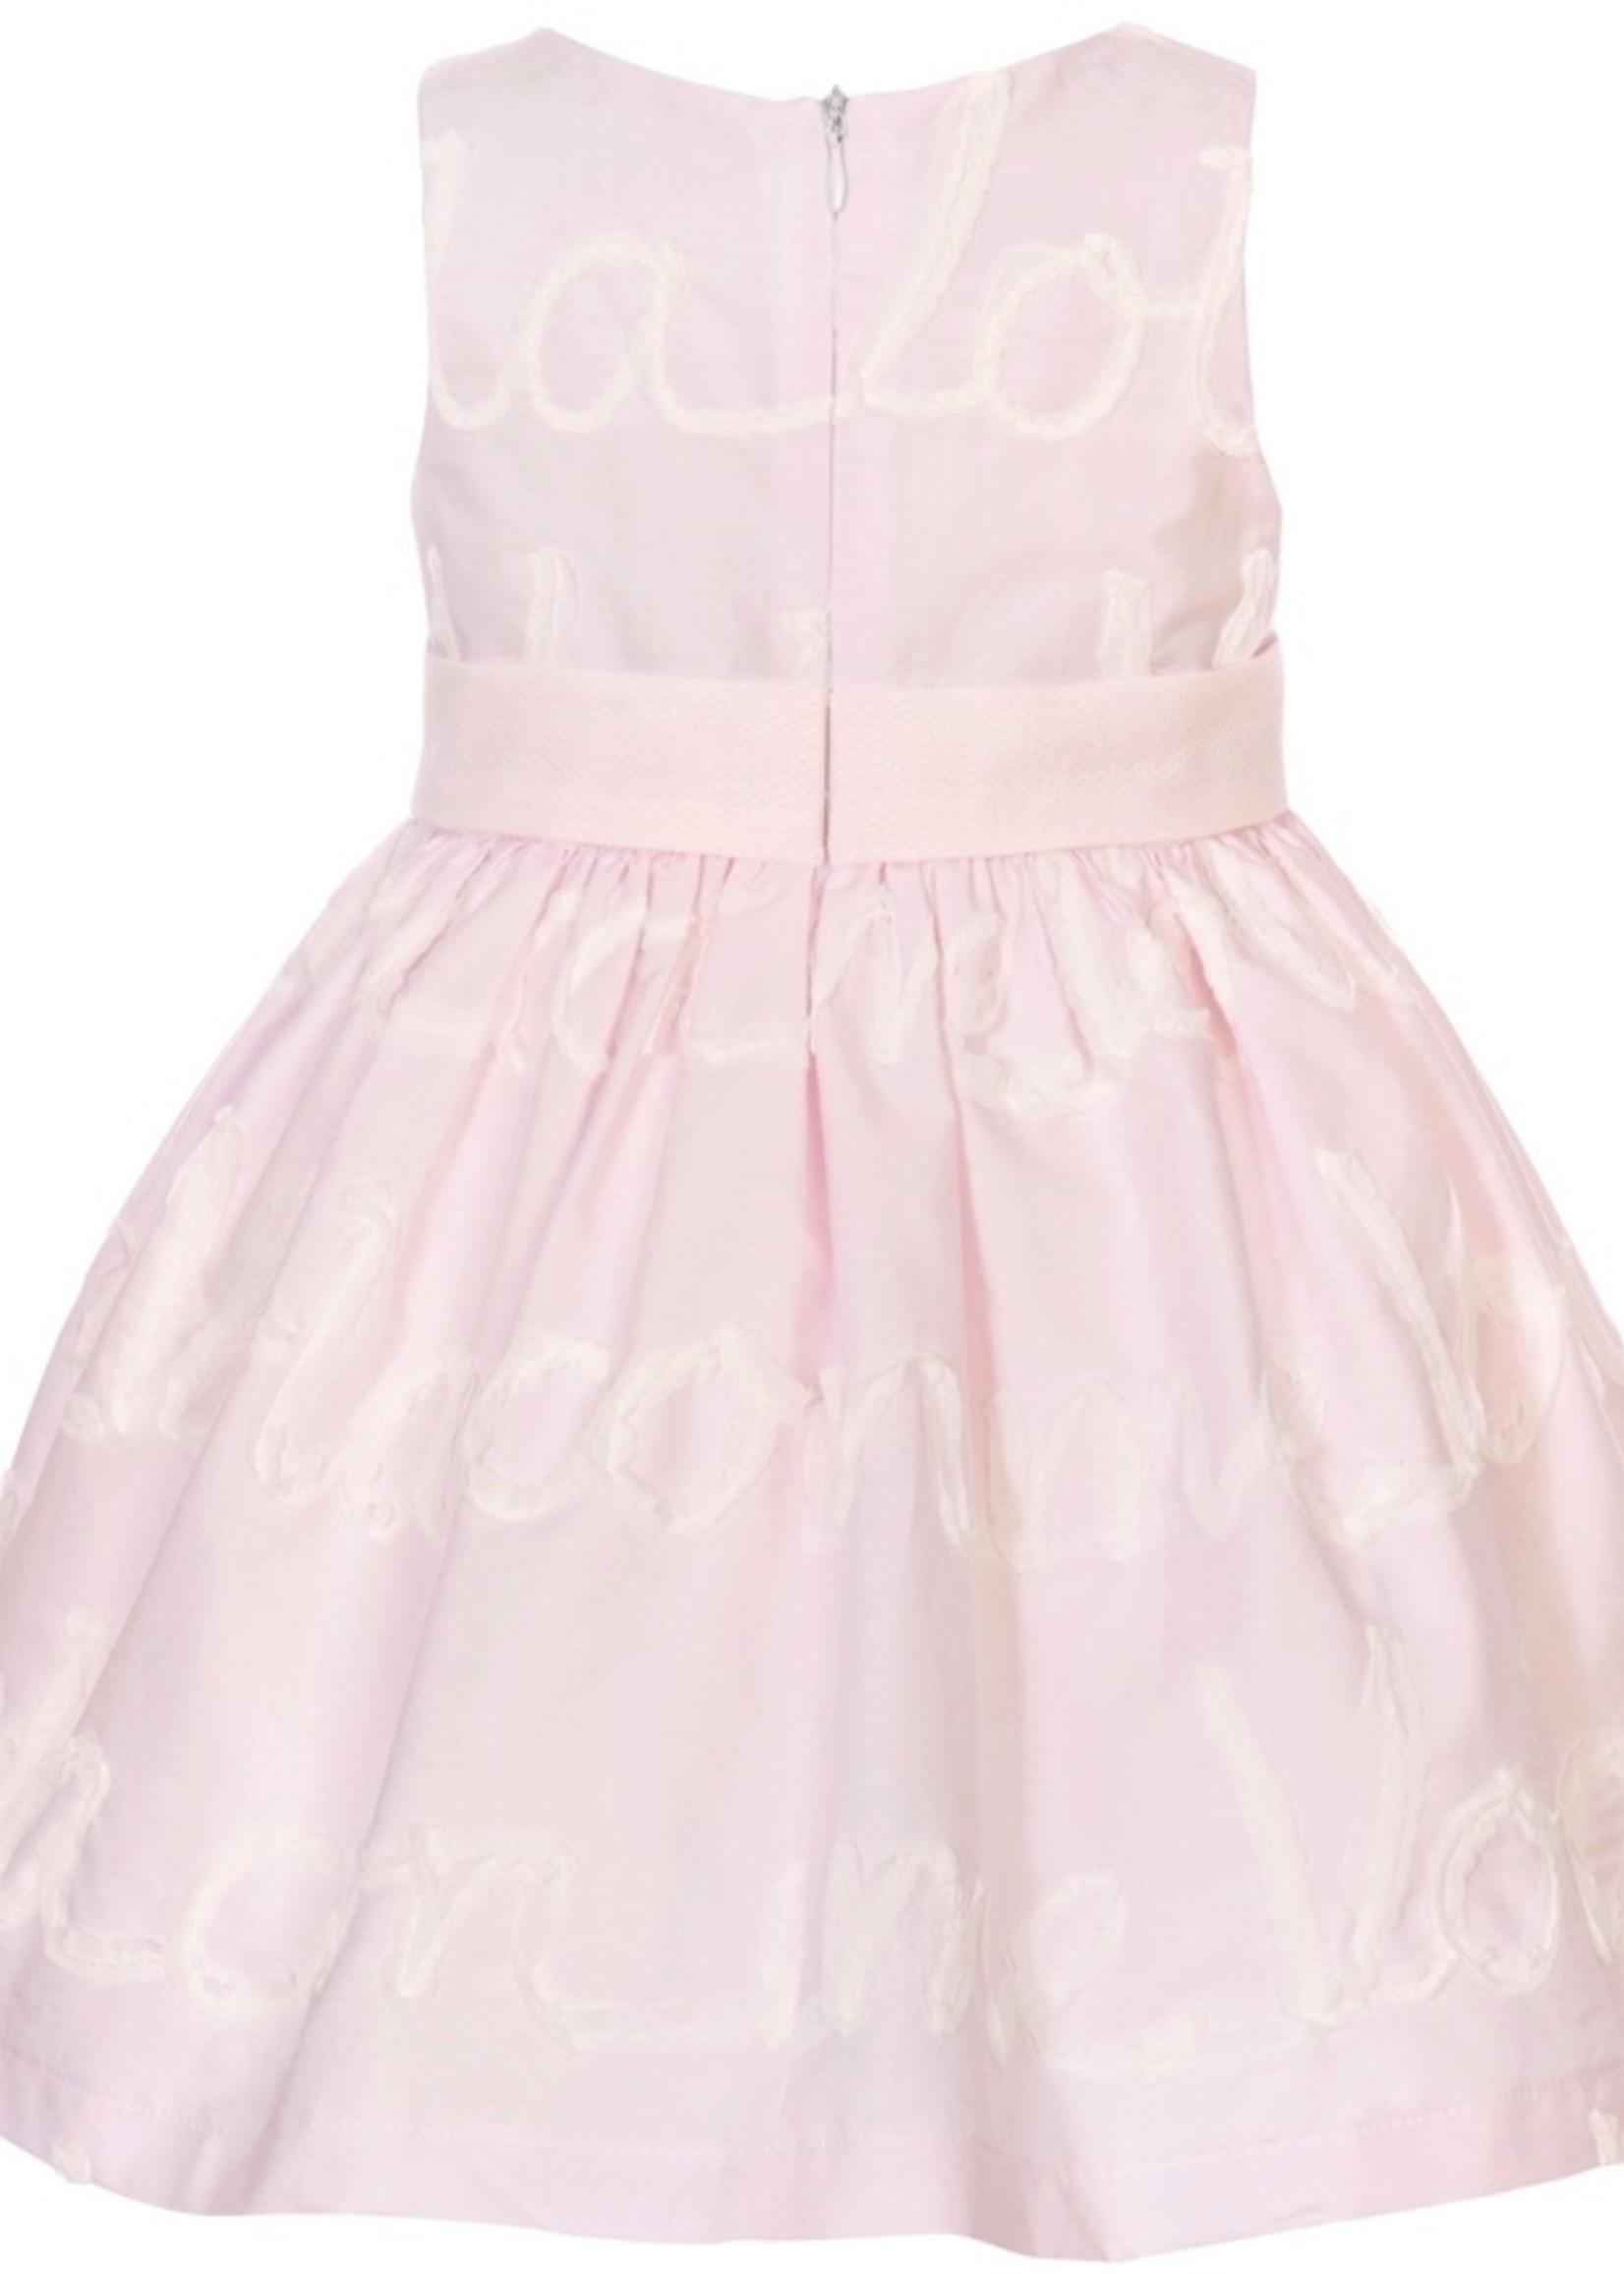 Balloon Chic Balloon Chic dress pink 217